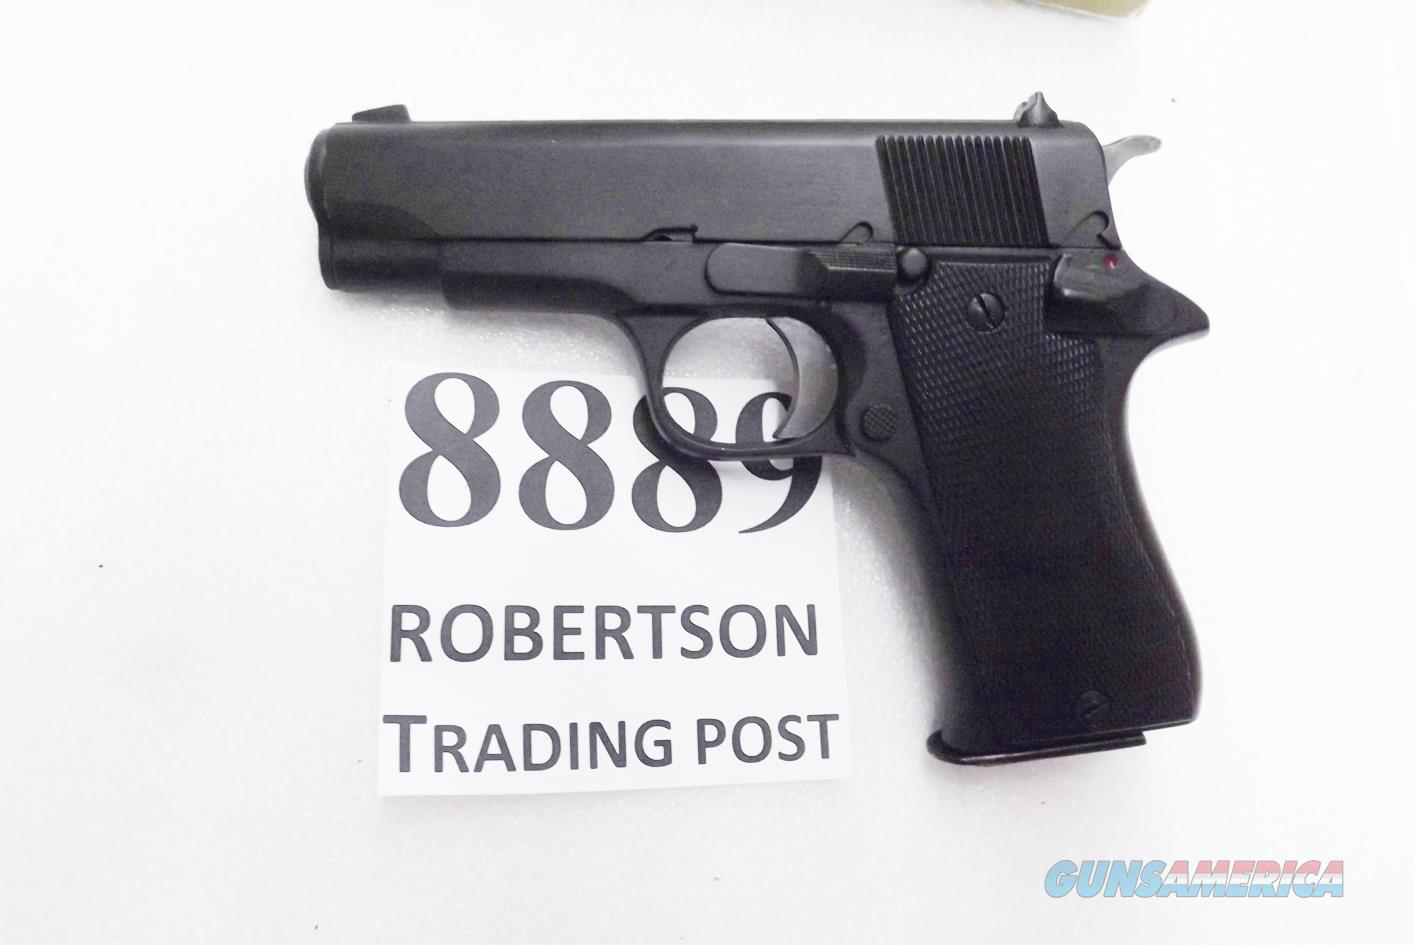 Star Spain 9mm Model BM 9 Compact Spanish Guardia 1977 Dura Coat Refinish VG-Exc 3 3/4 inch PD Size Colt Defender Ancestor Steel 9 Shot BM9 BM-9 Spain  Guns > Pistols > Star Pistols